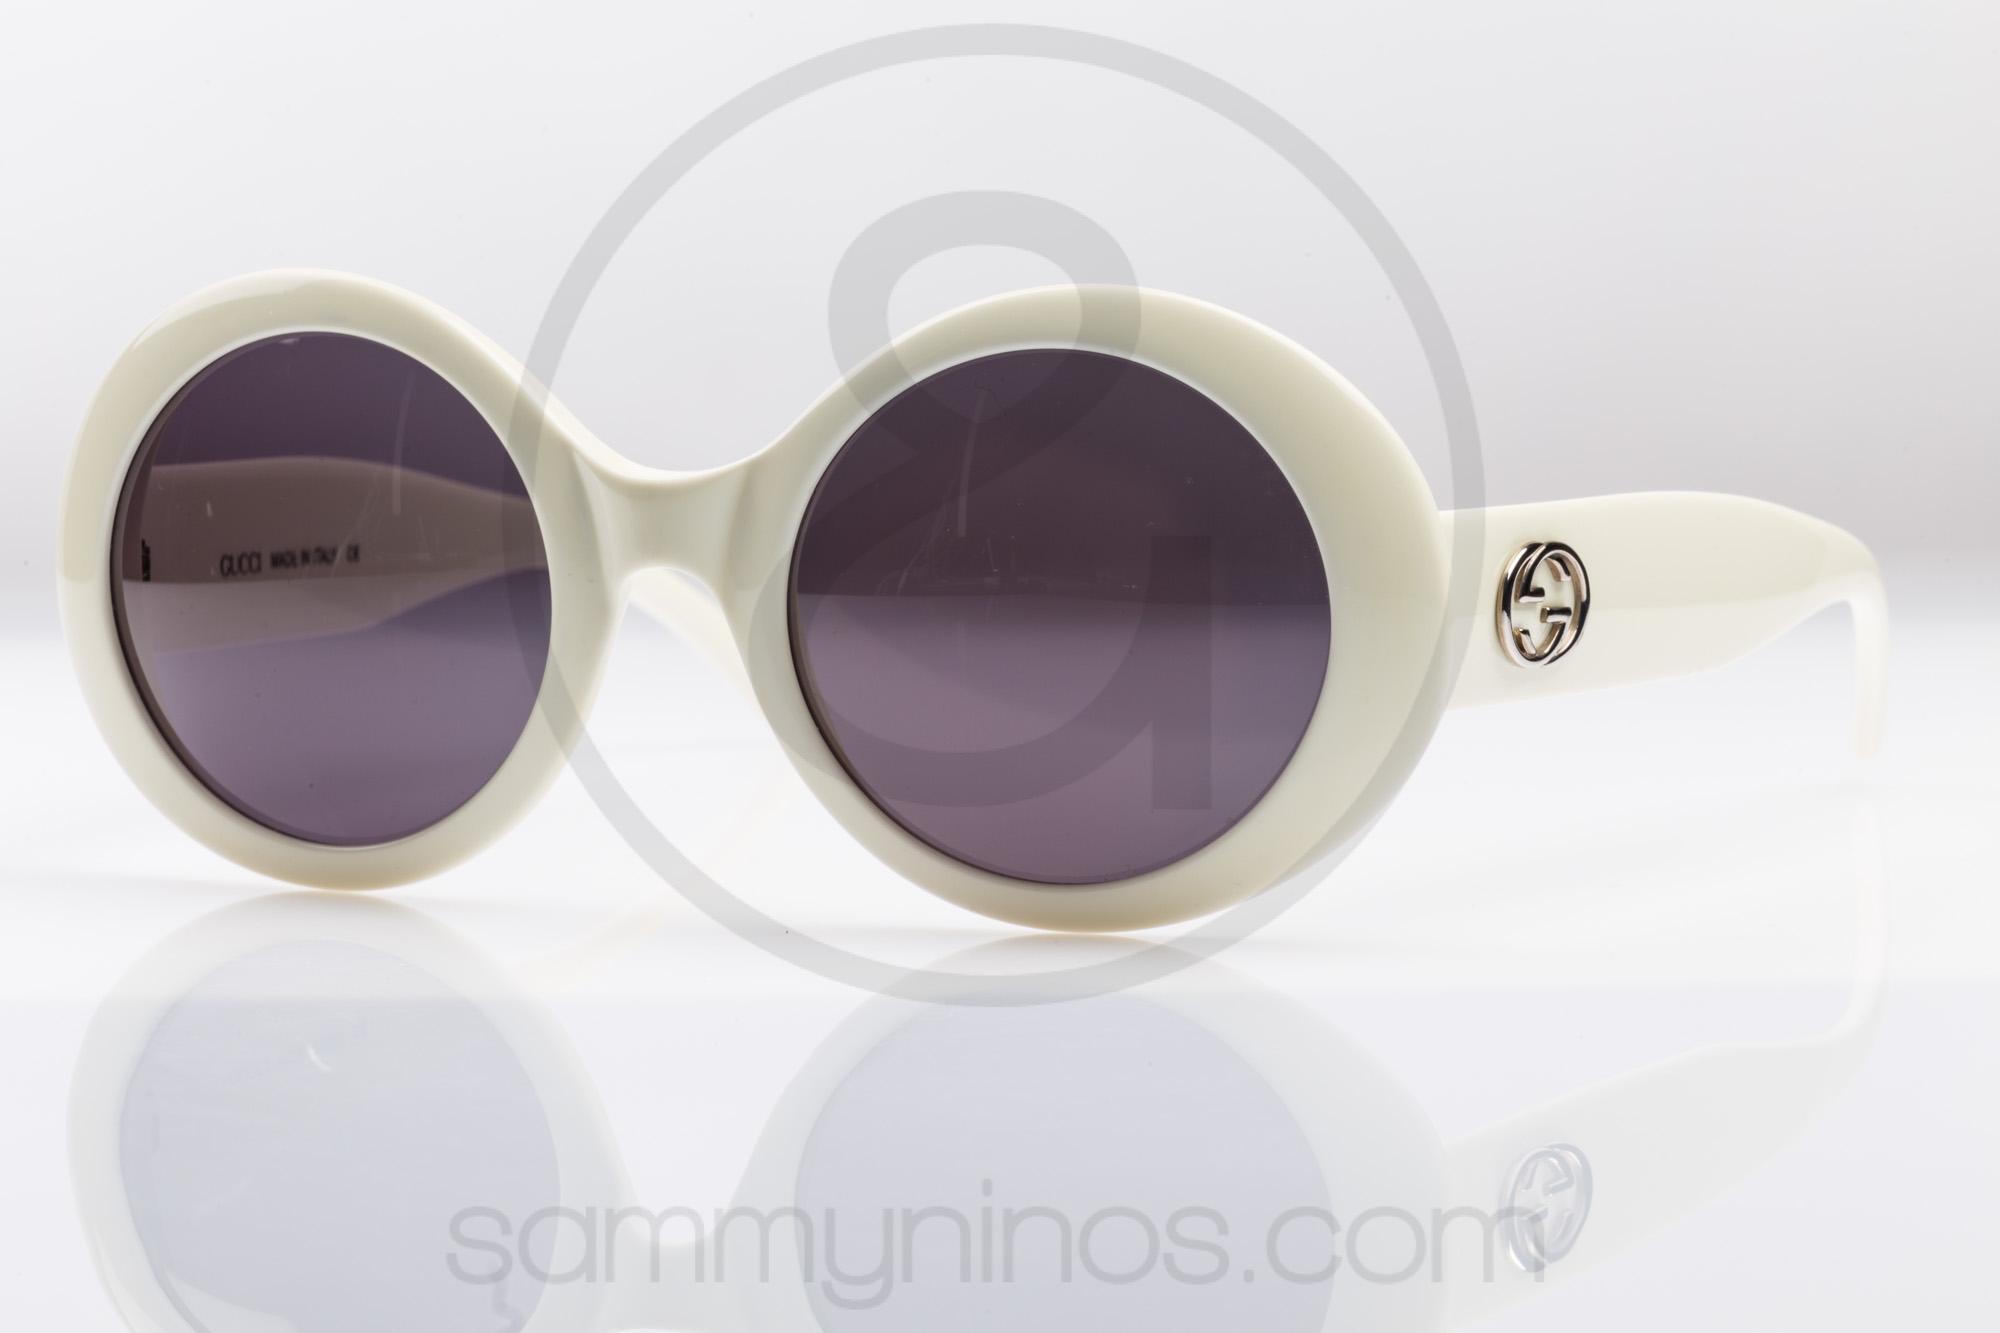 7da2ca053 ... Sunglasses Authent Source · Gucci GG 2401 N S Sammy & Nino s Store